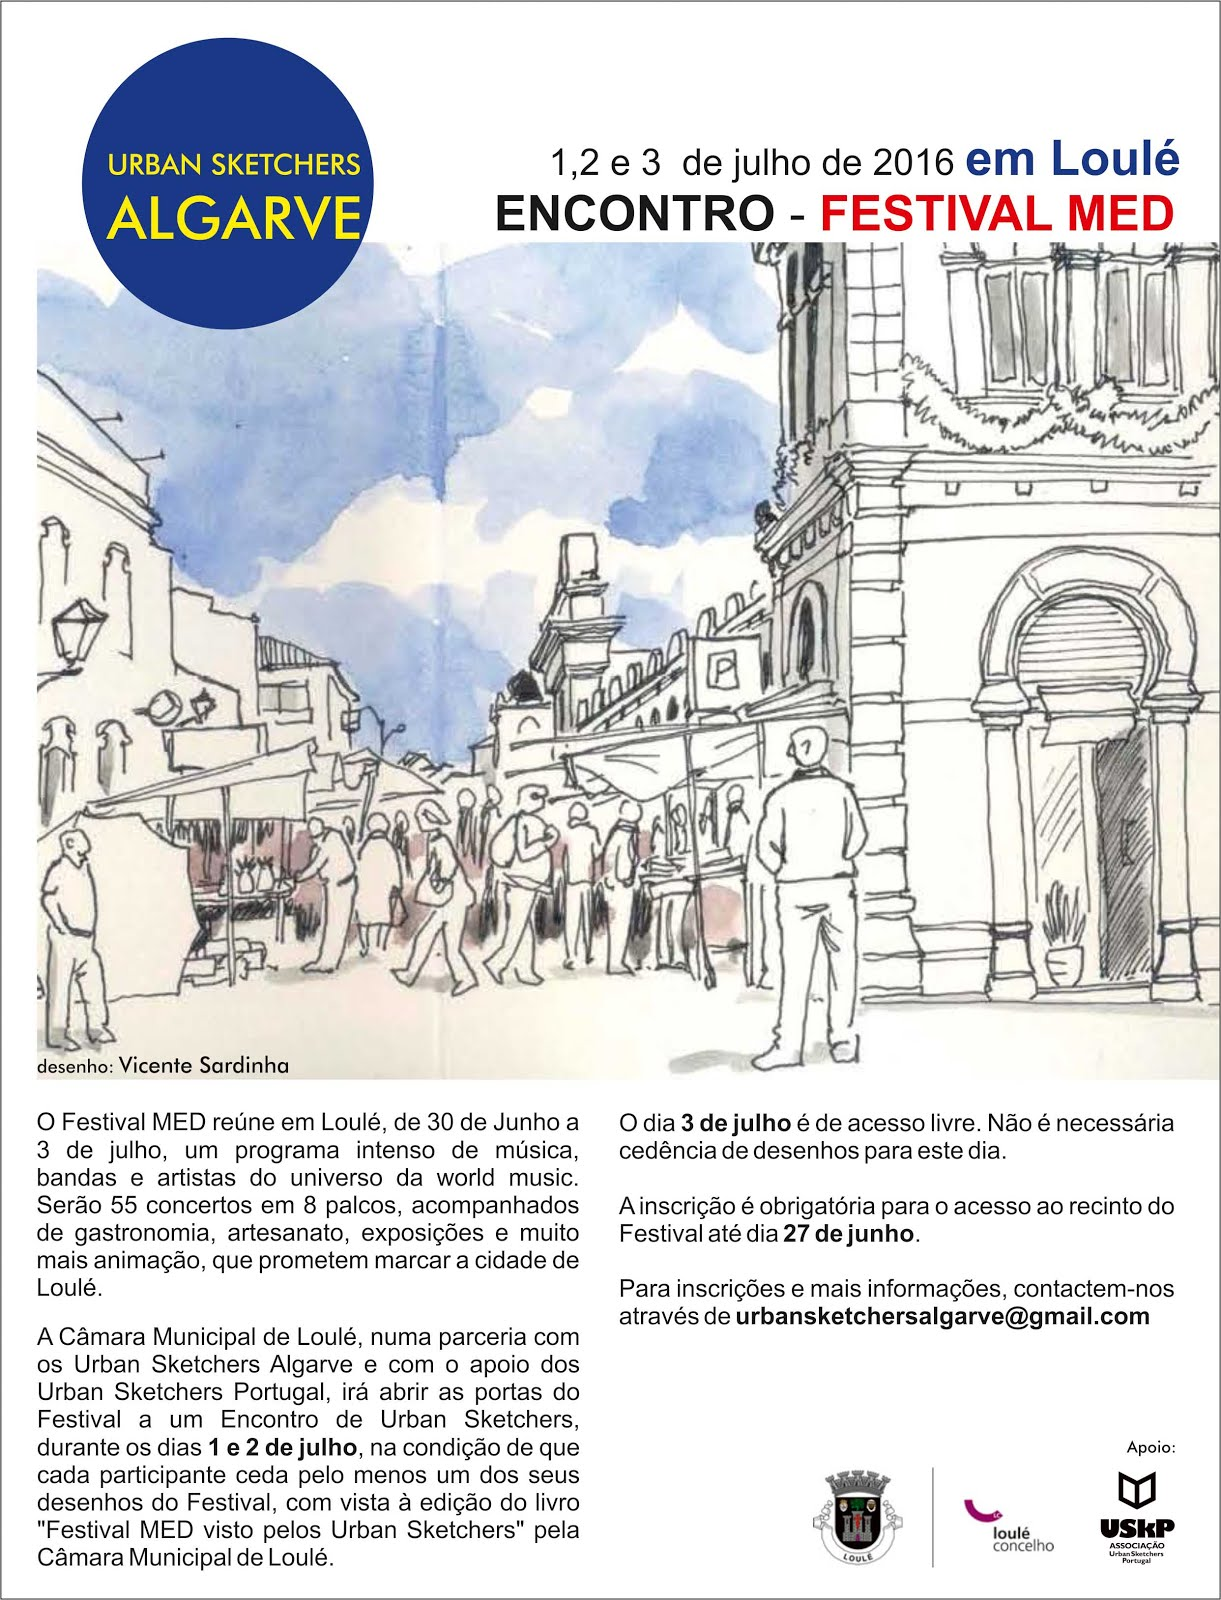 Encontro Festival MED - Loulé